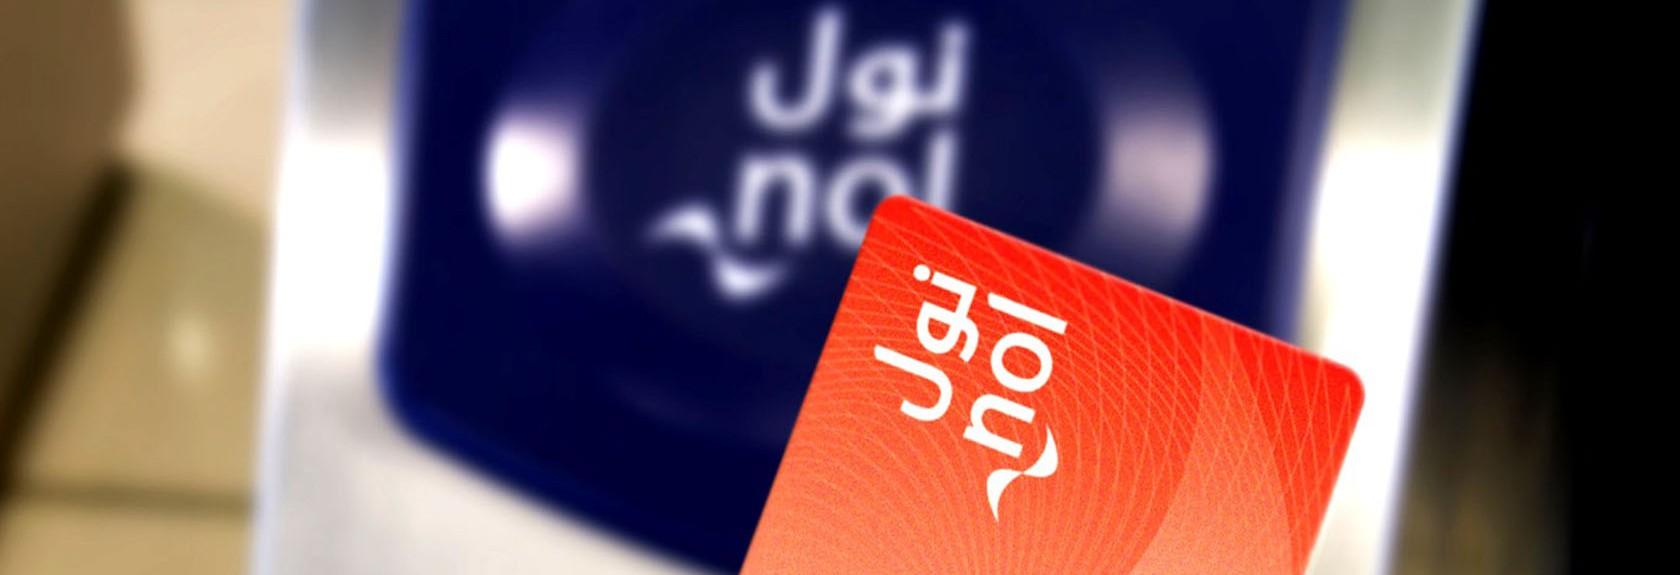 De Nol Card – de OV chipkaart van Dubai